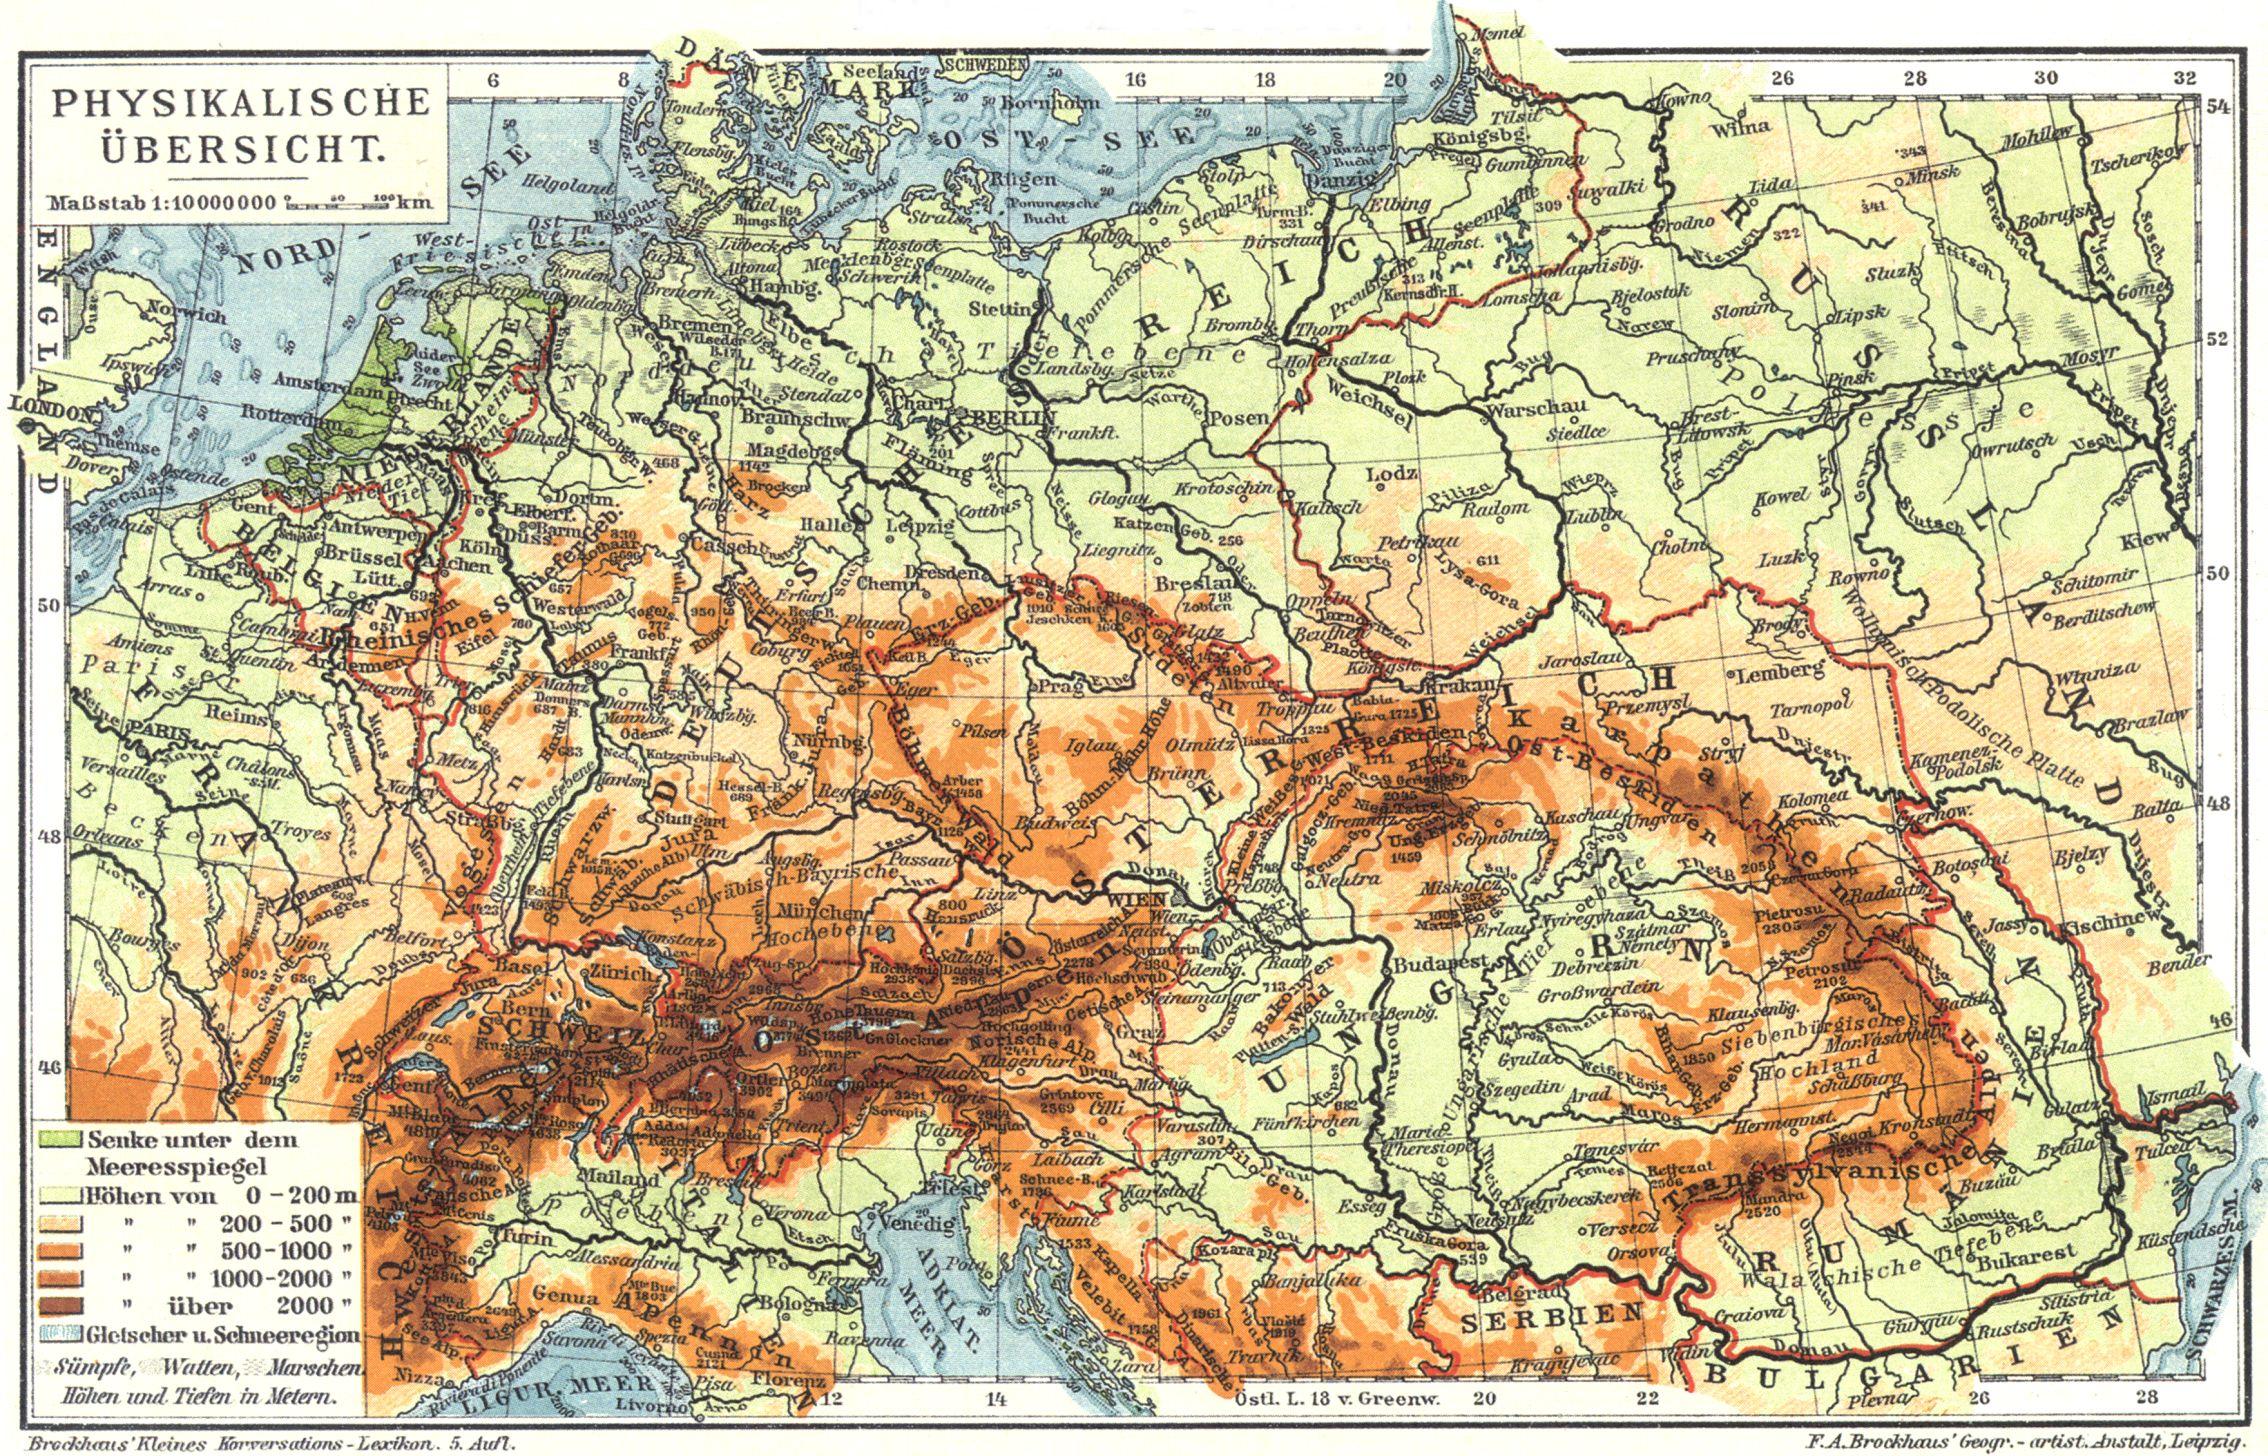 Mitteleuropa I Karte Physikalische Ubersicht Zeno Org